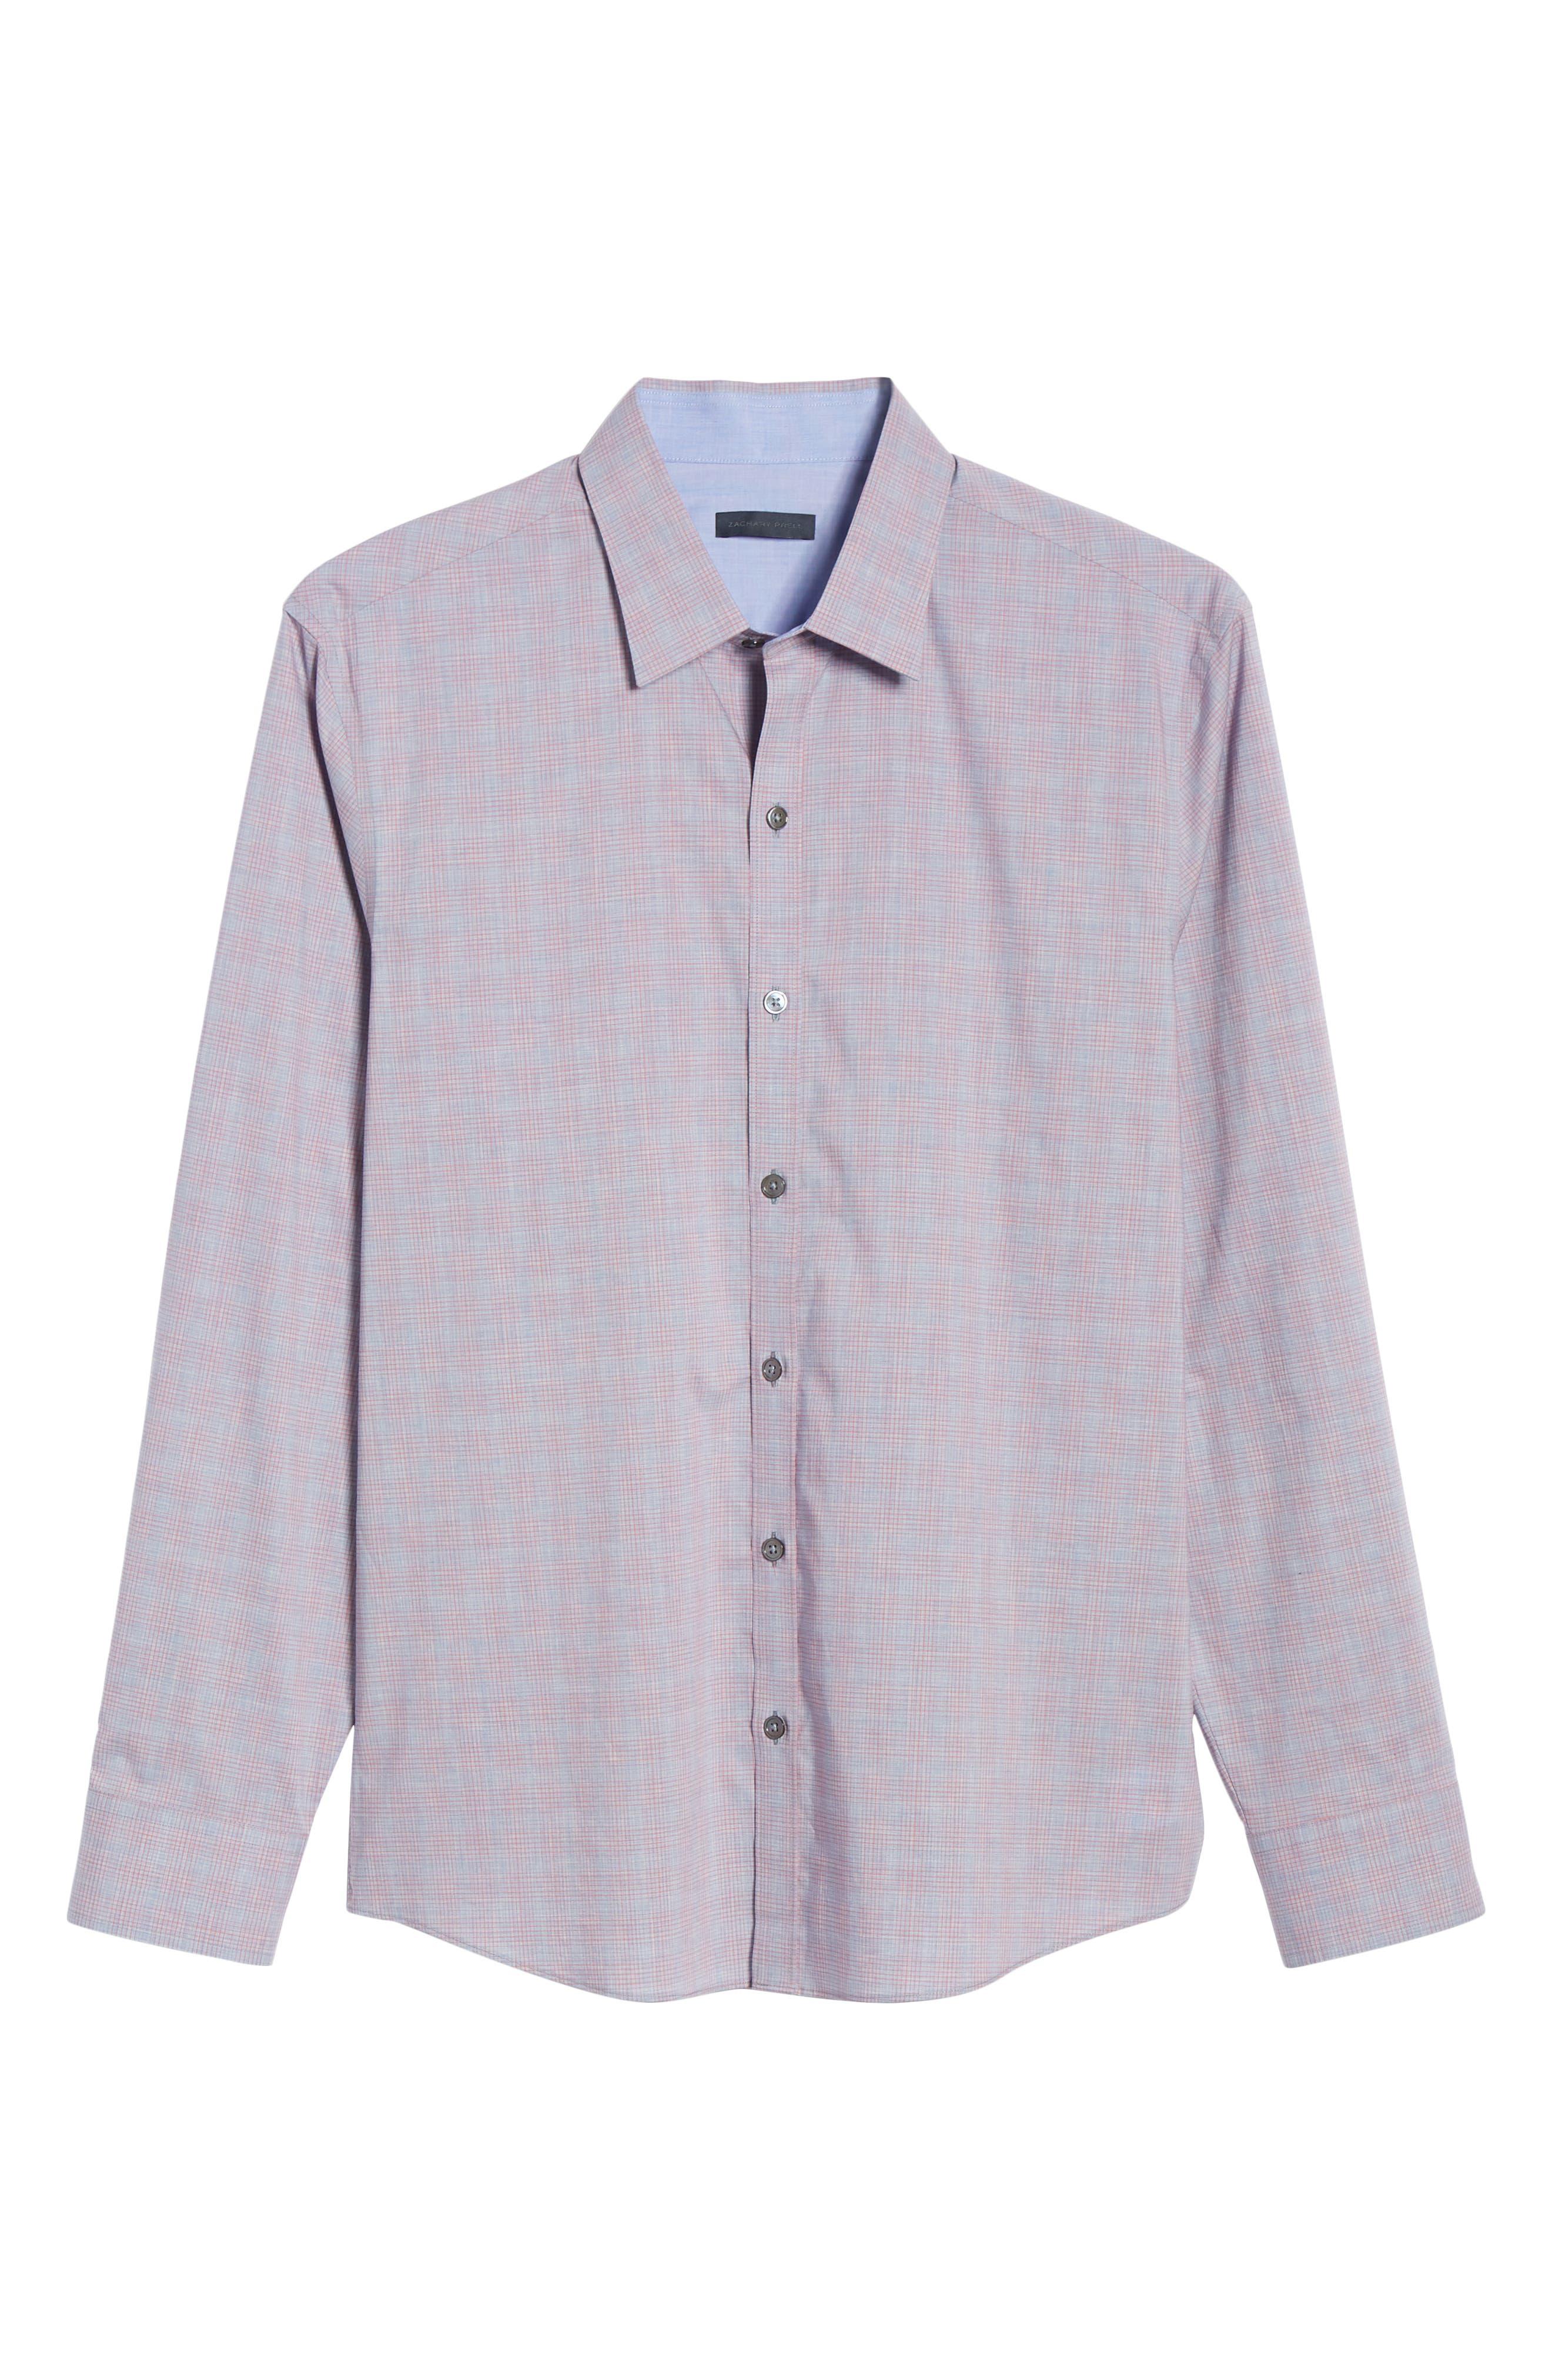 ZACHARY PRELL, Buckland Regular Fit Sport Shirt, Alternate thumbnail 5, color, FLAMINGO